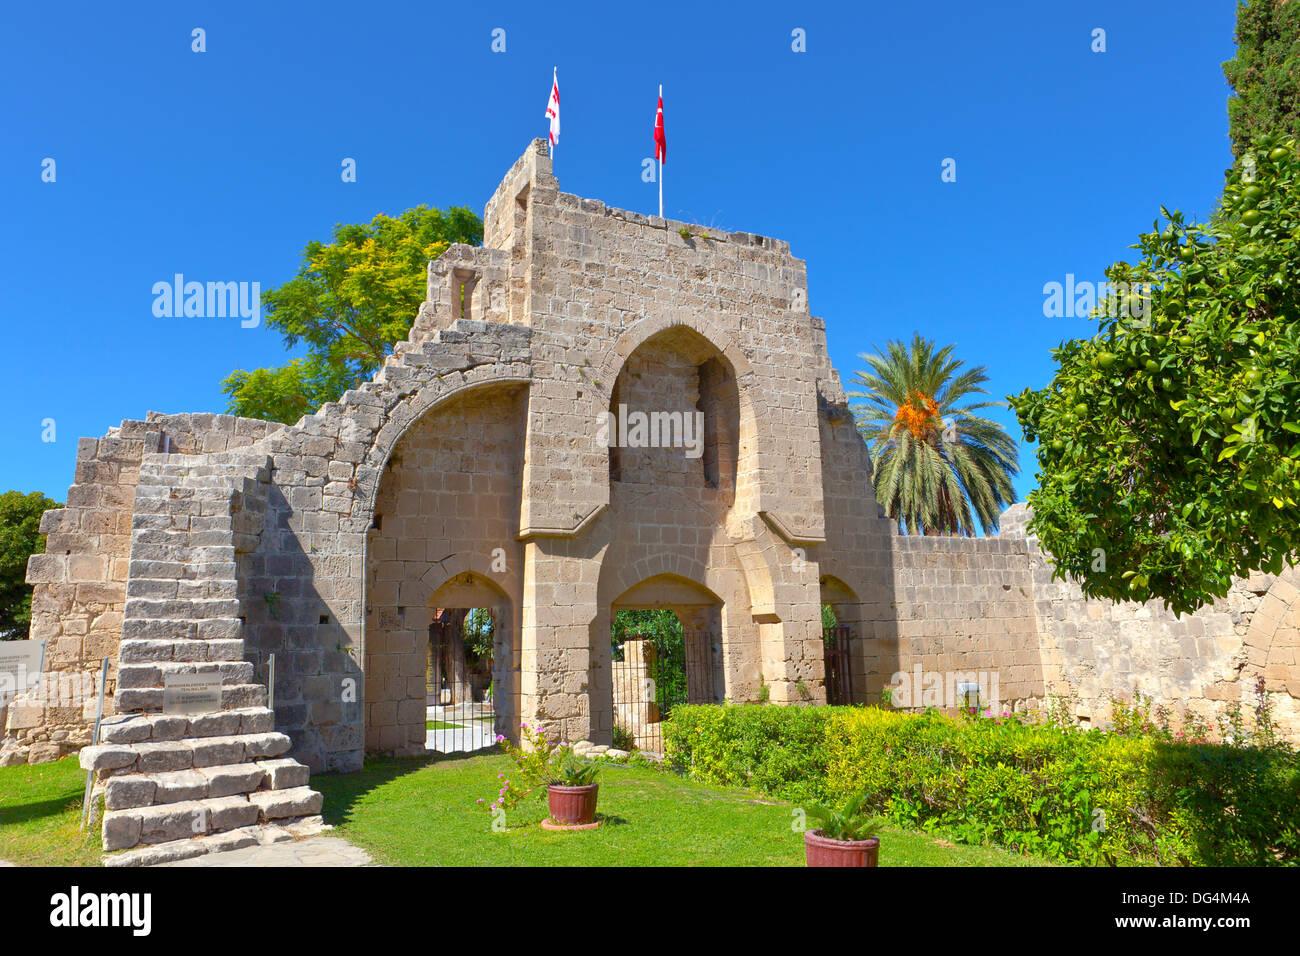 Historic Bellapais Abbey in Kyrenia, Cyprus. - Stock Image